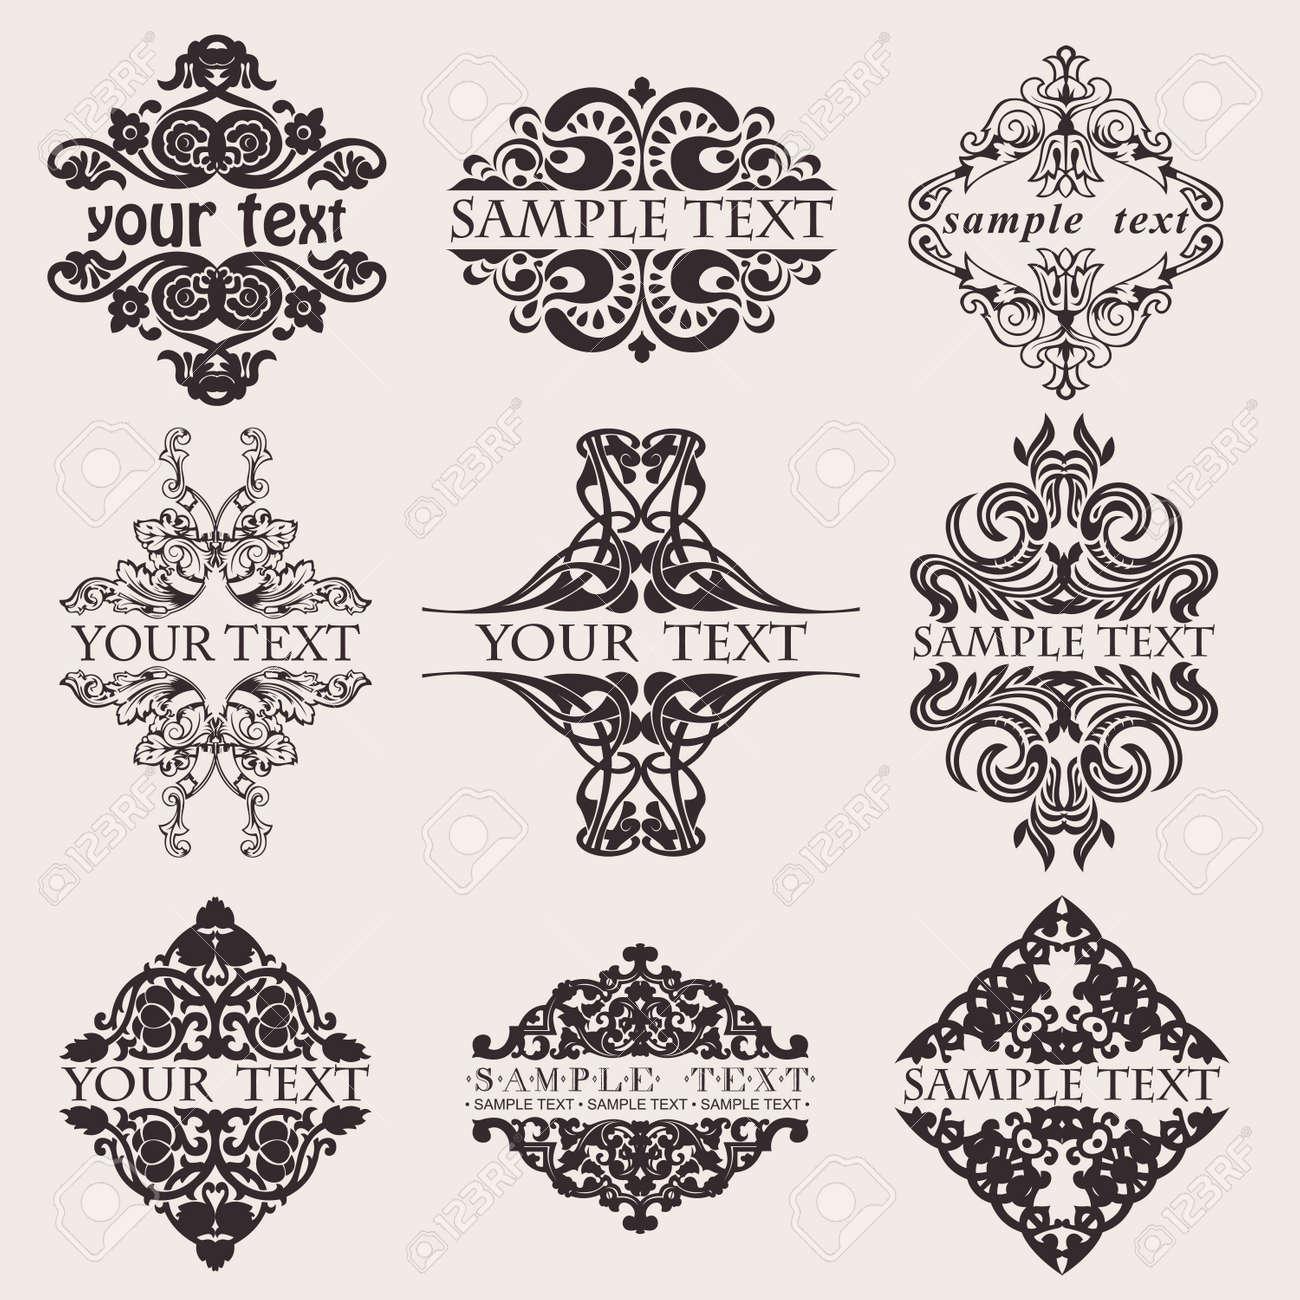 Set Of Nine Ornate Banner Text Quad - 13635195